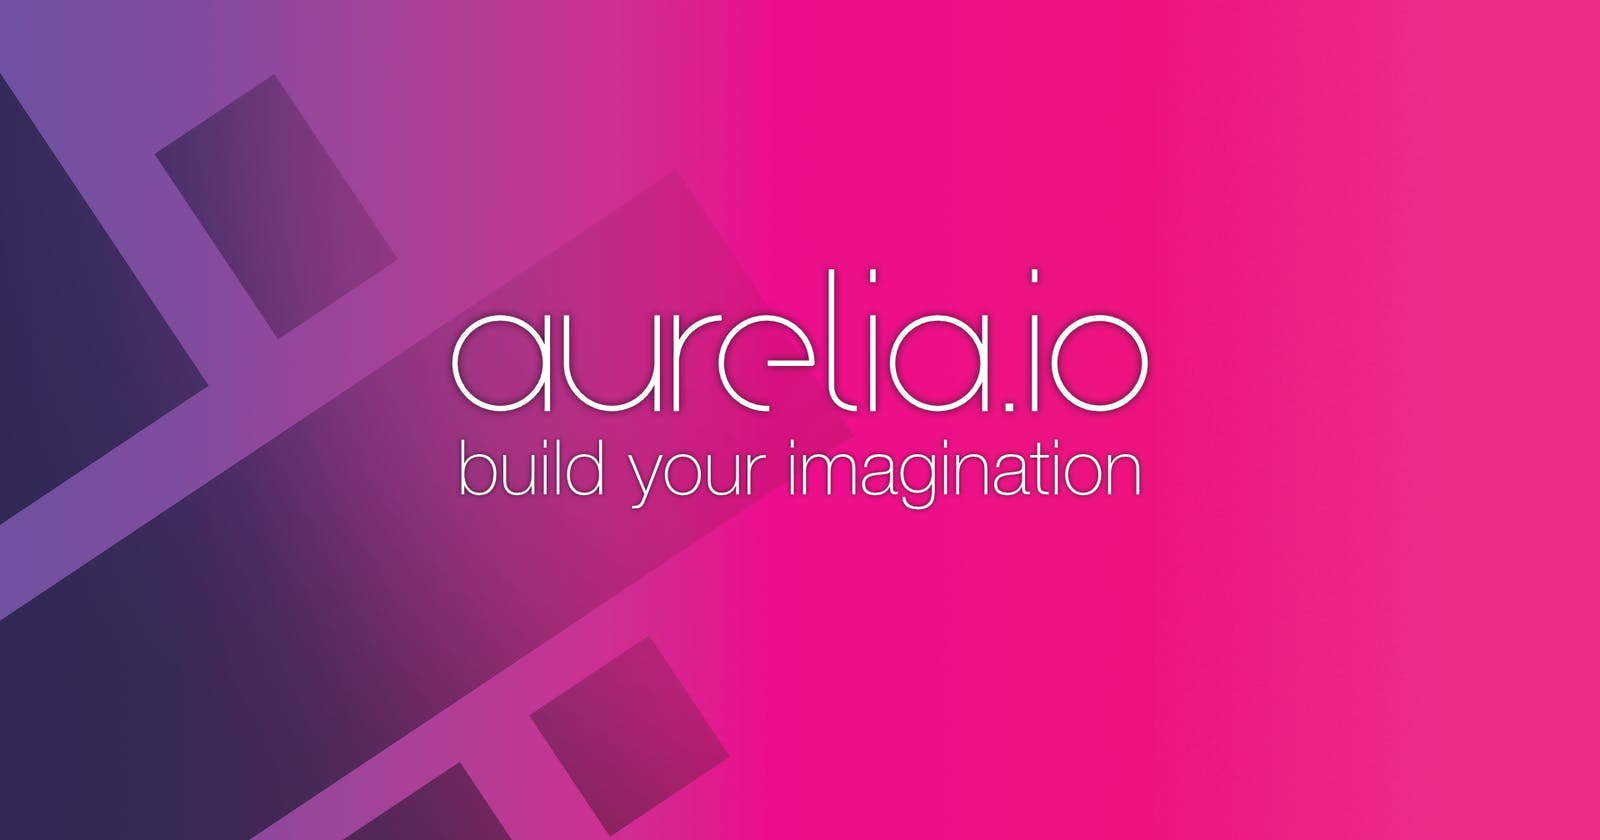 Aurelia: First impressions